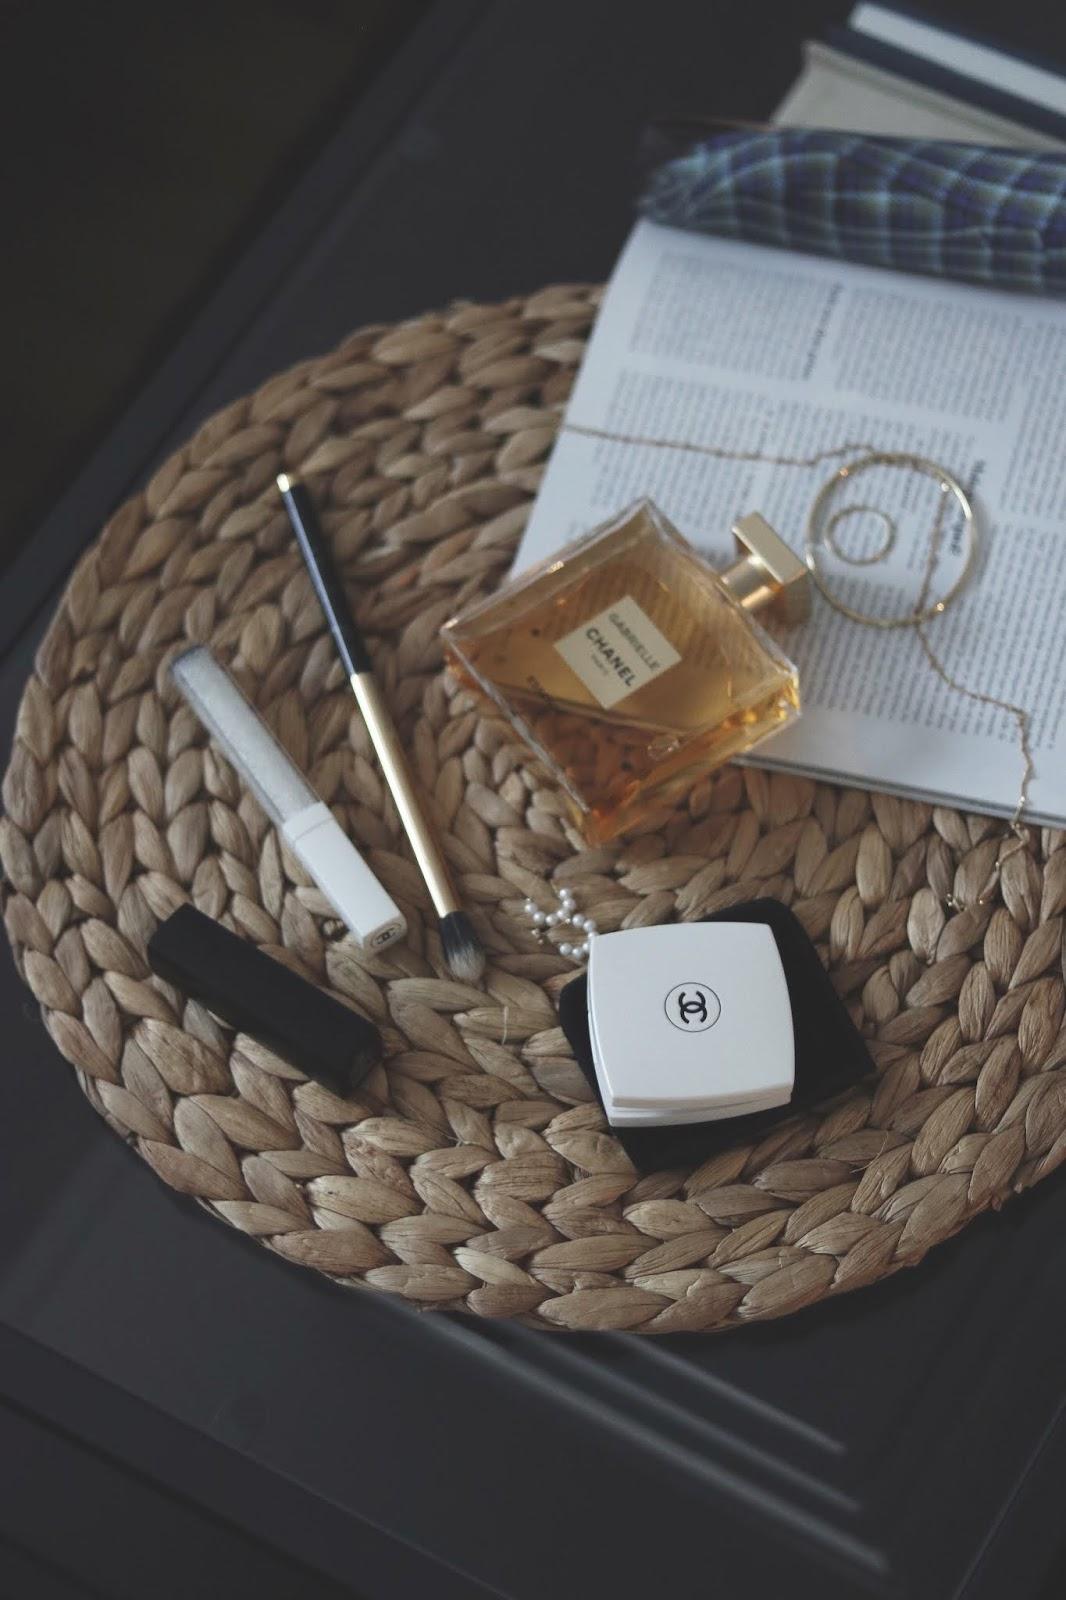 CHANEL Gabrielle Chanel Essence quick review aleesha harris